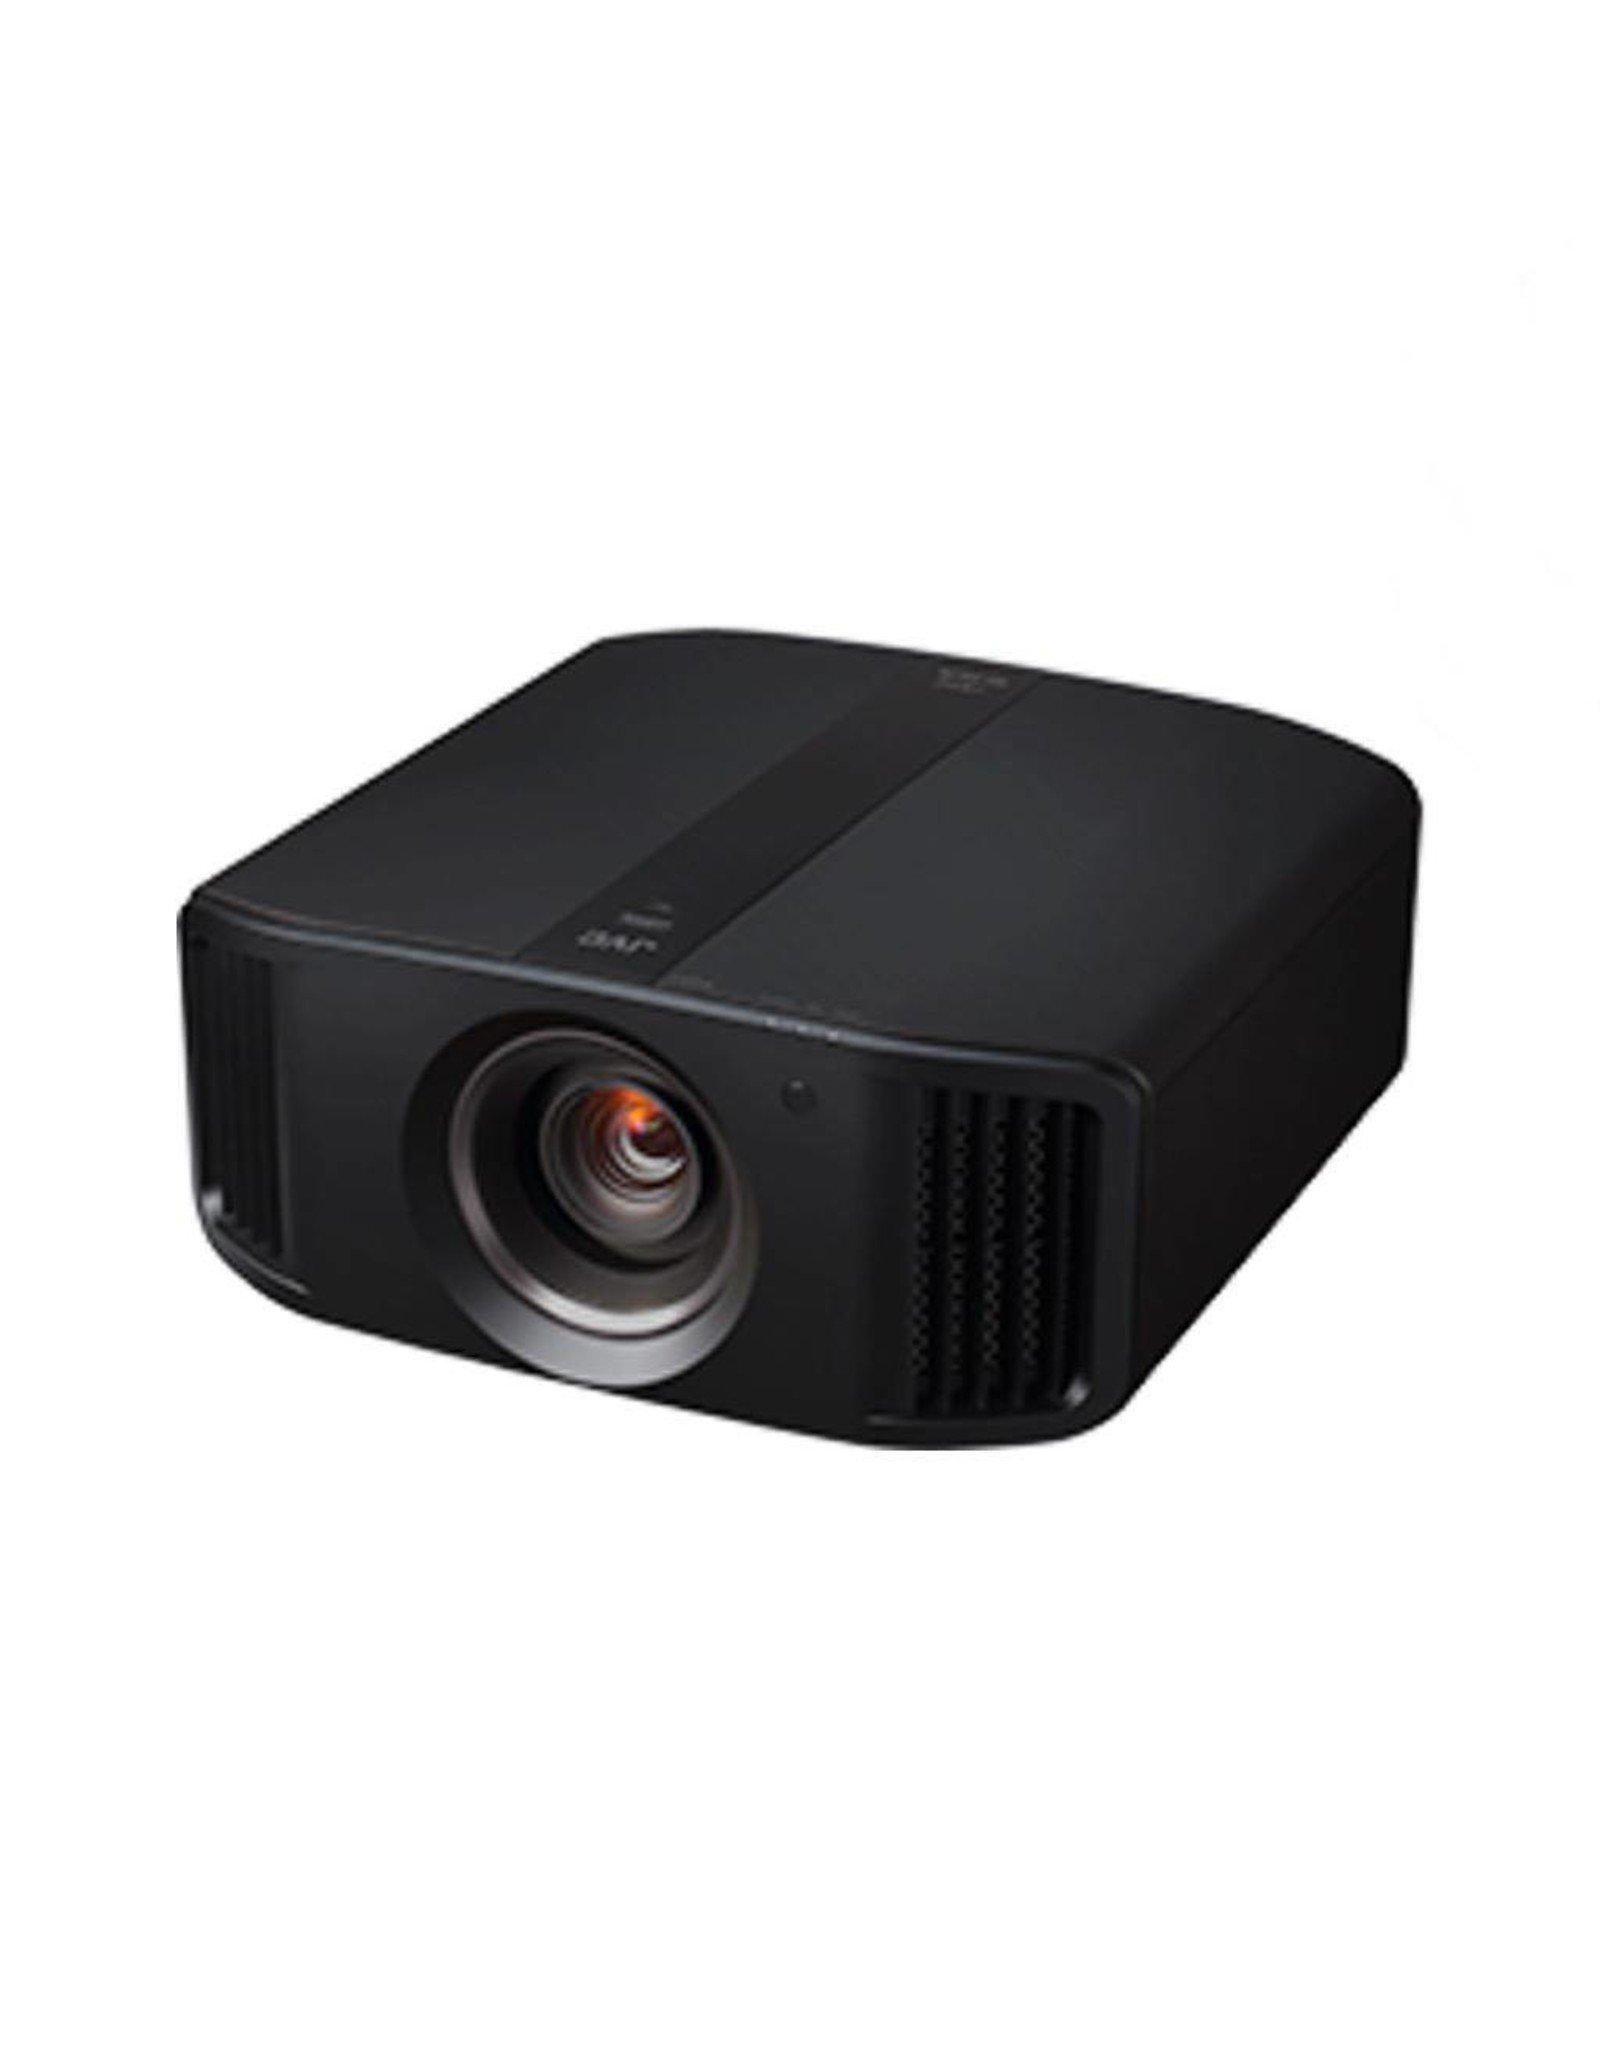 JVC JVC DLA-N7 4K DILA Projector, BLACK